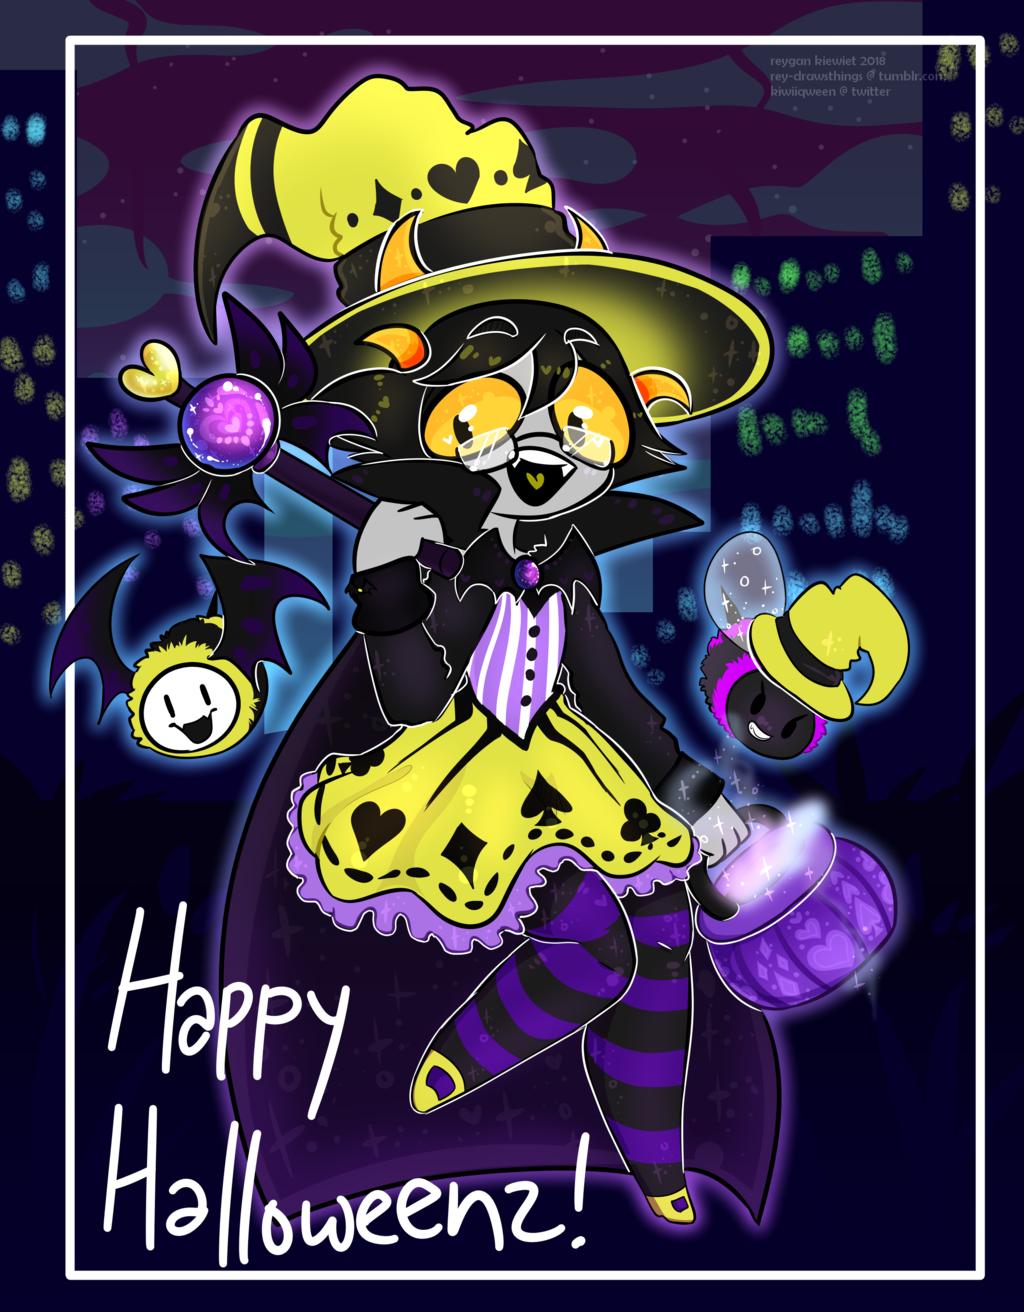 Happy Halloweenz!